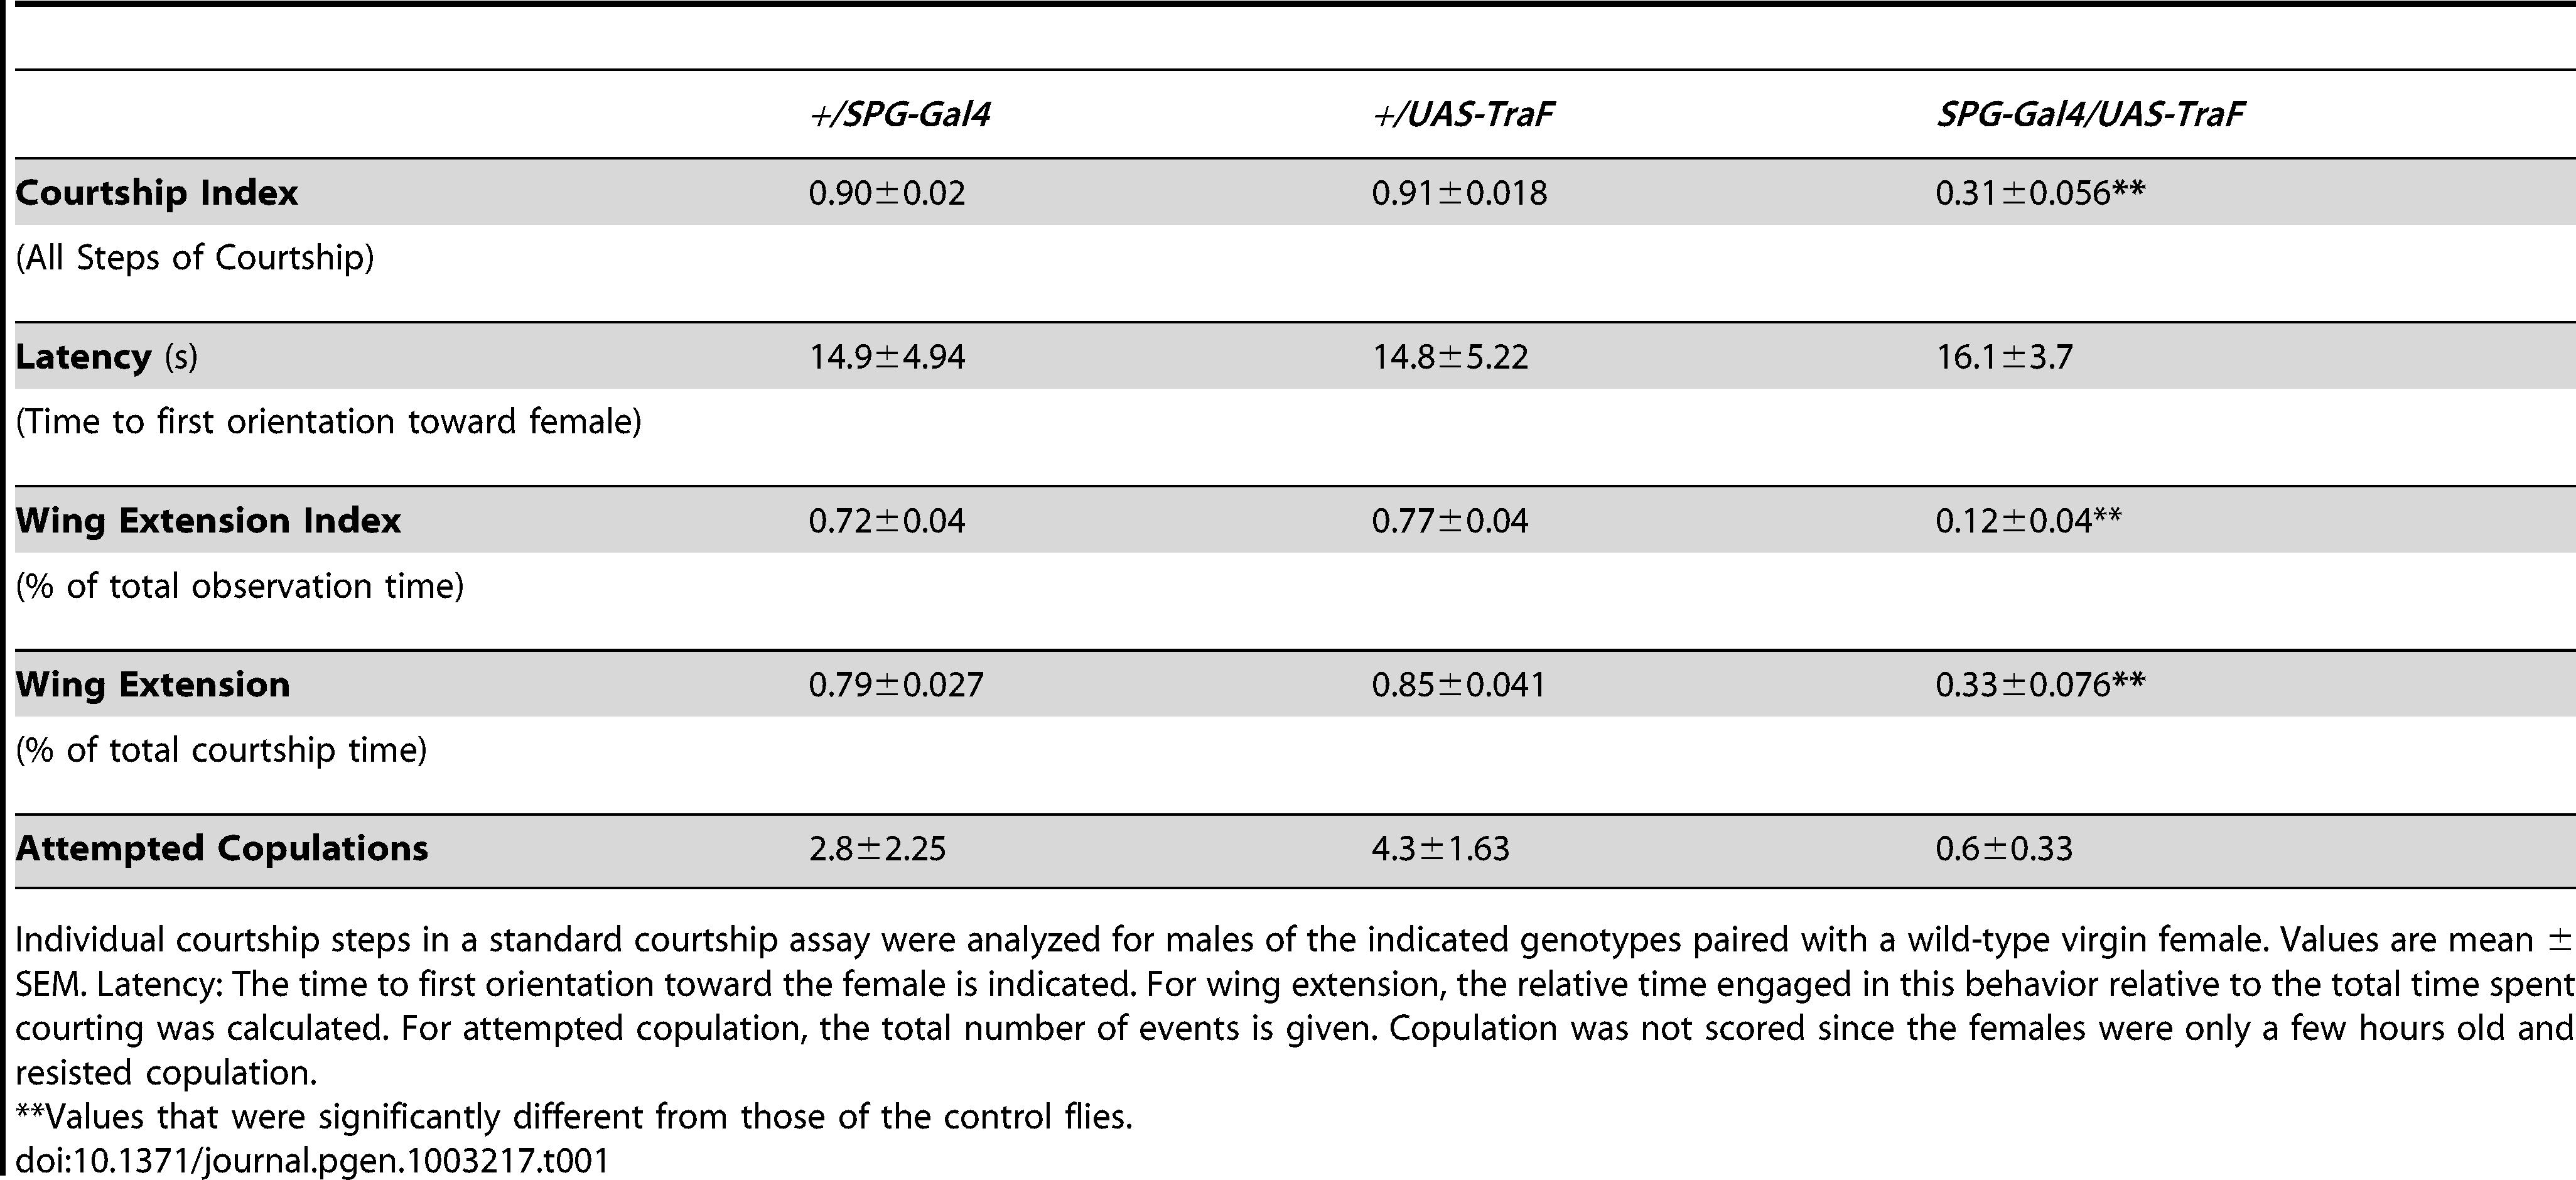 Individual courtship elements in <i>SPG-Gal4/UAS-TraF</i> males.